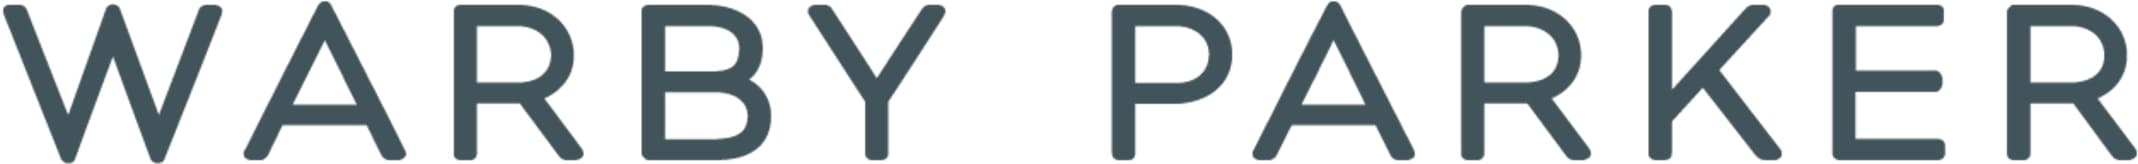 Warby Parker Logo png